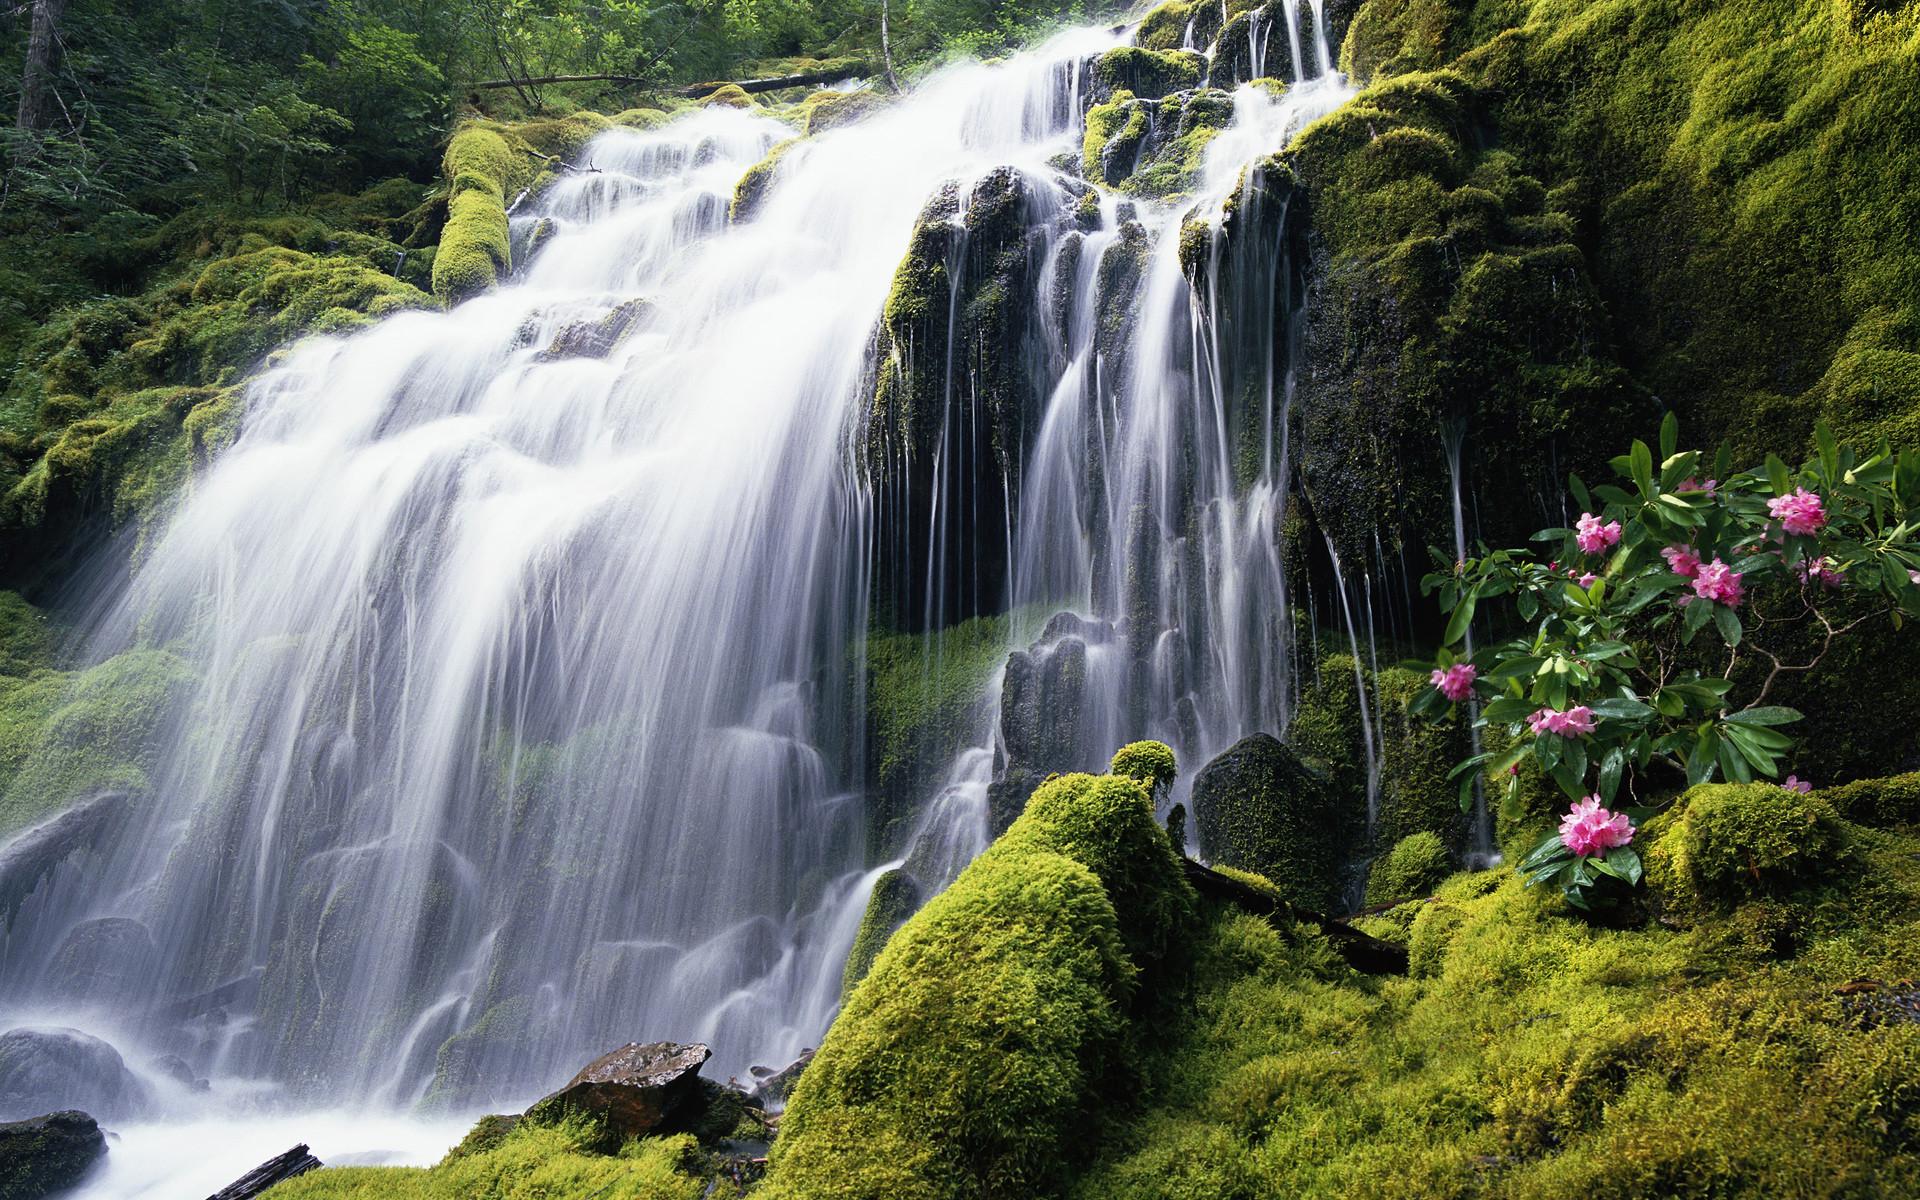 Forest Waterfall HD Wallpaper Forest Waterfall HD Wallpaper |  ImageBank.